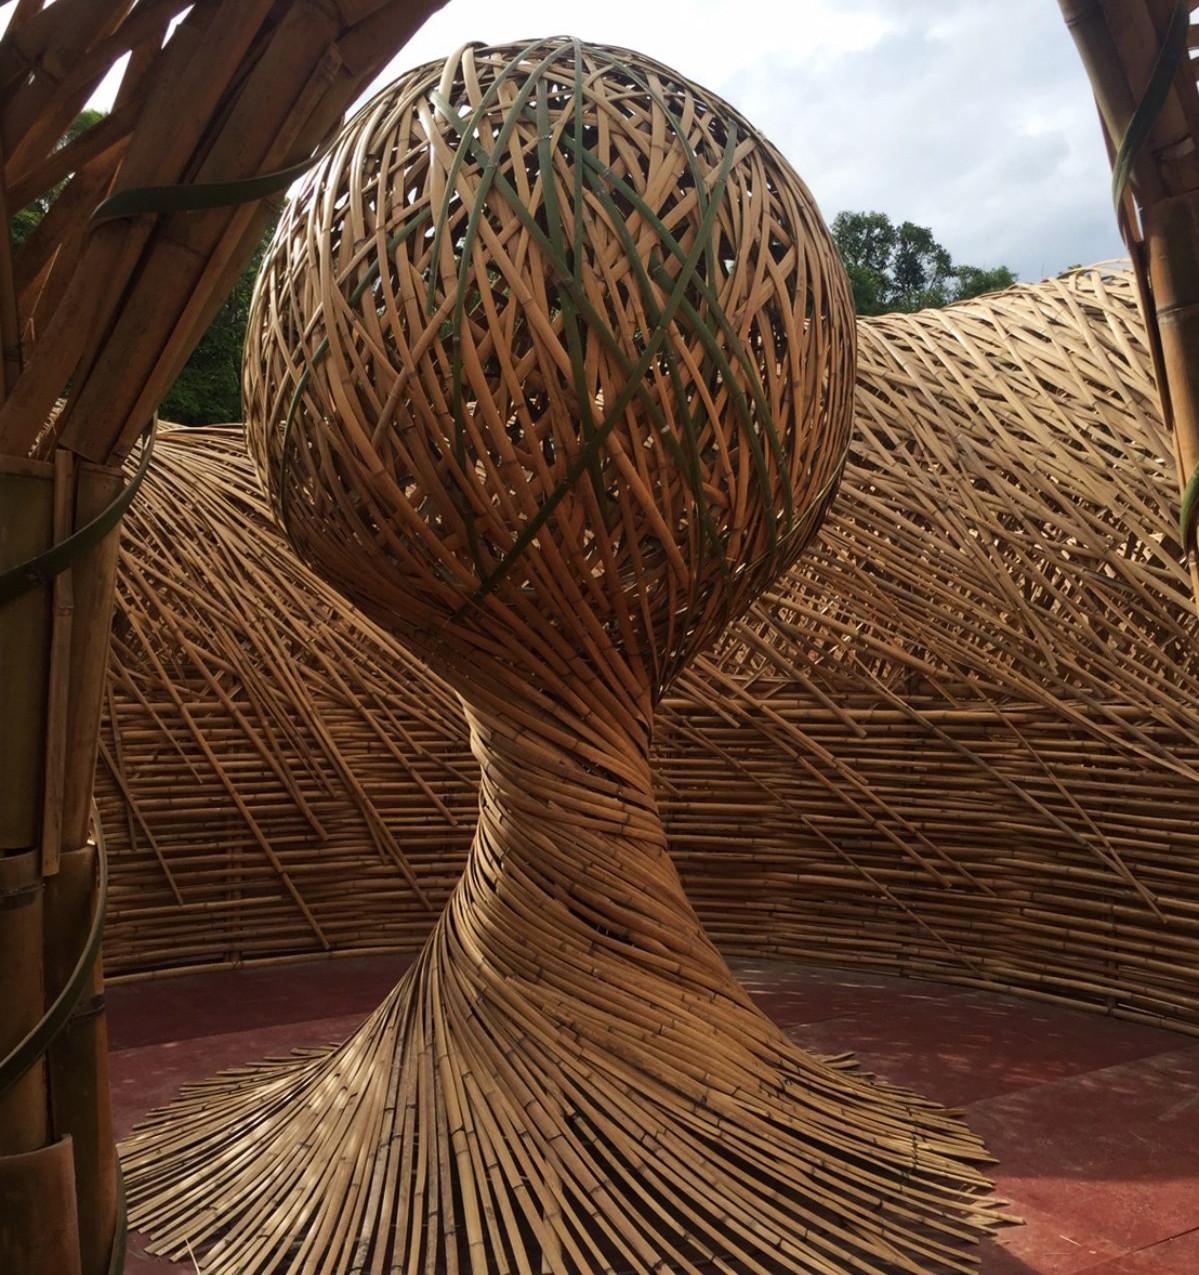 The Ripple Maze at Gaoshuang (6)